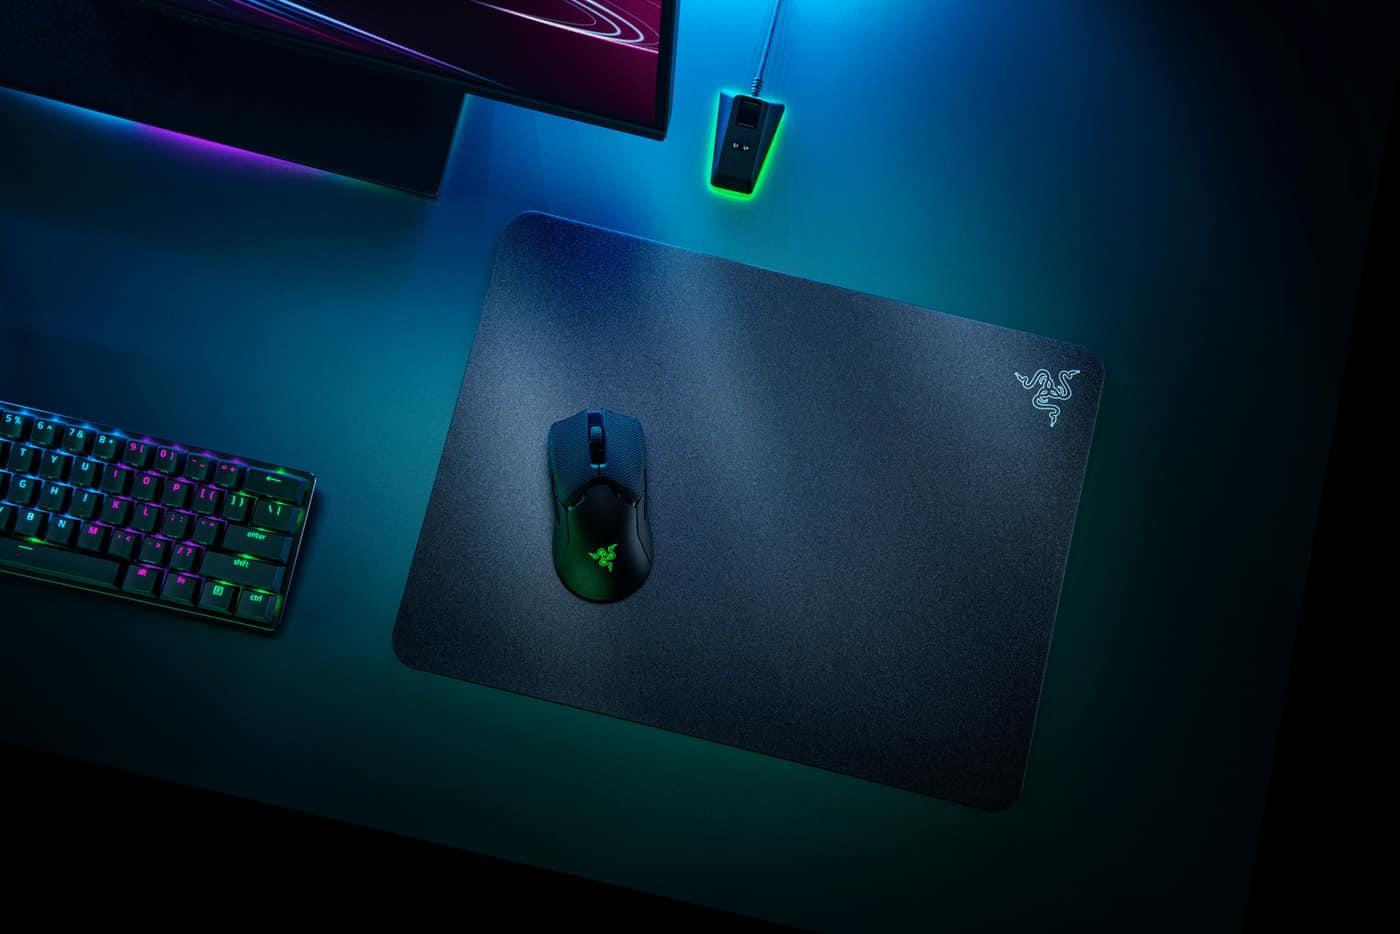 Souris d'ordinateur - Razer Acari Ultra Low Friction Gaming Mousemat Thin Hard Surface Antislip DI